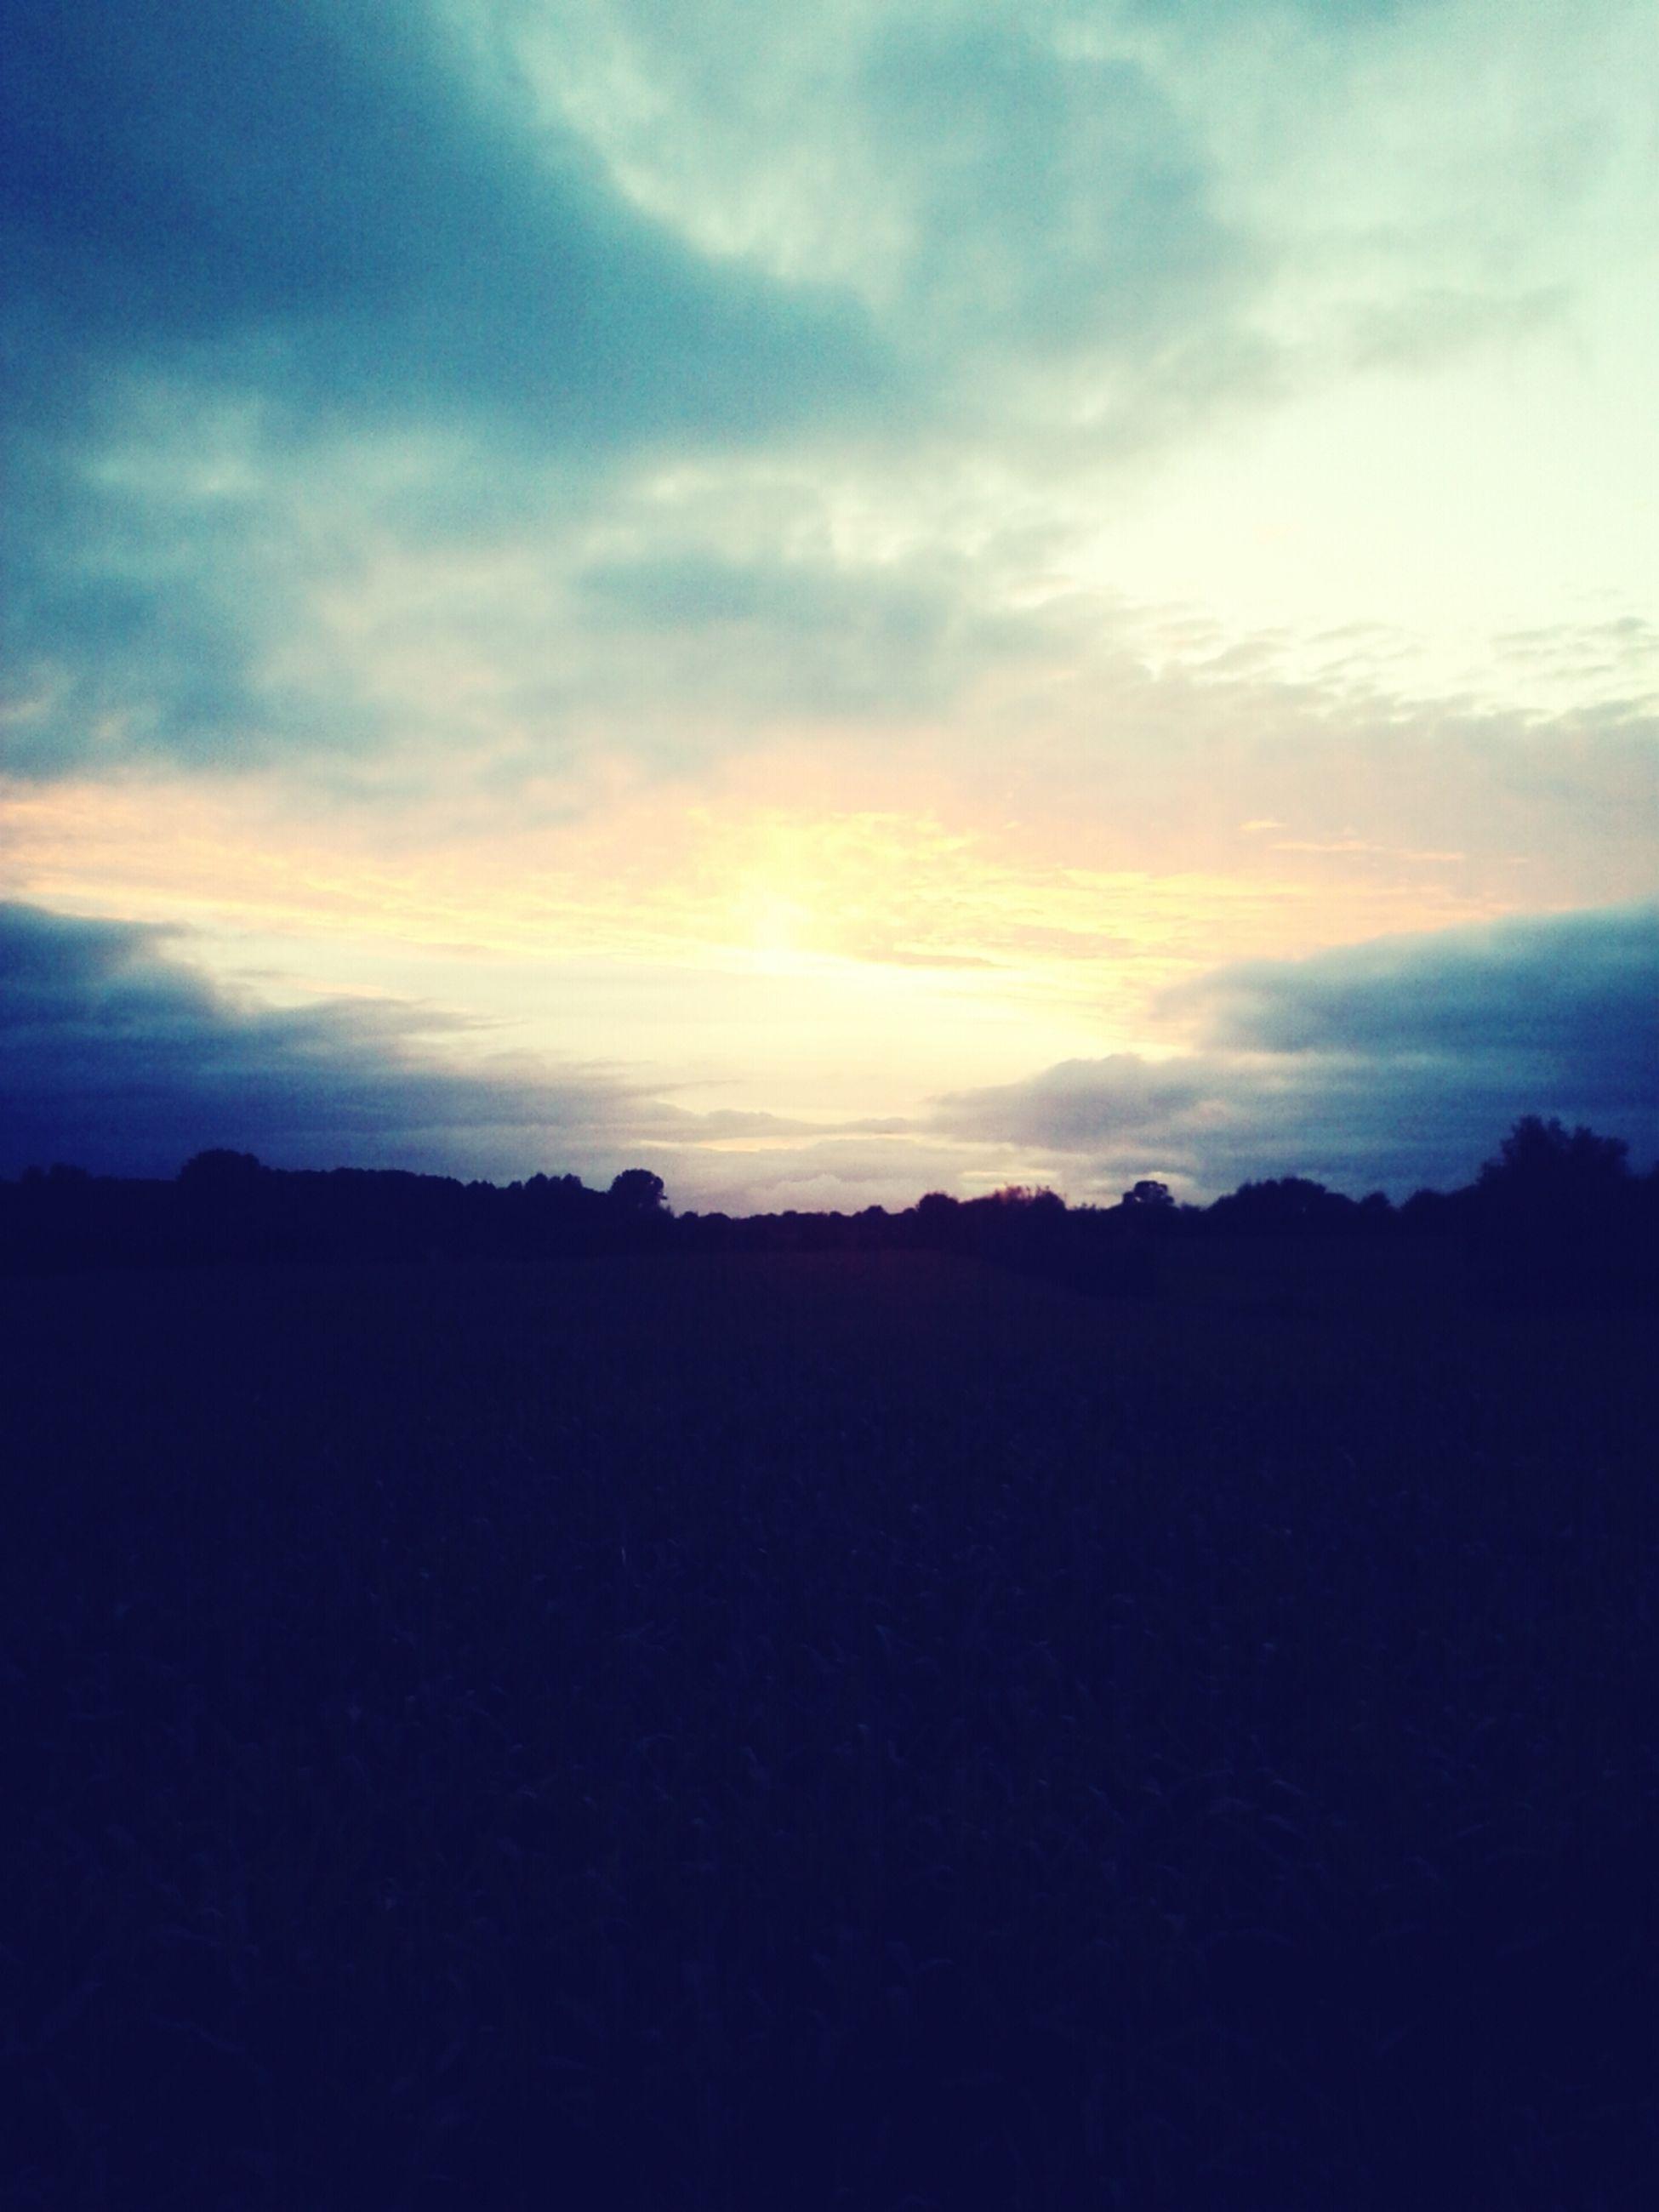 silhouette, sunset, tranquil scene, scenics, sky, tranquility, beauty in nature, landscape, cloud - sky, nature, idyllic, dark, cloud, dusk, outline, copy space, orange color, outdoors, non-urban scene, horizon over land